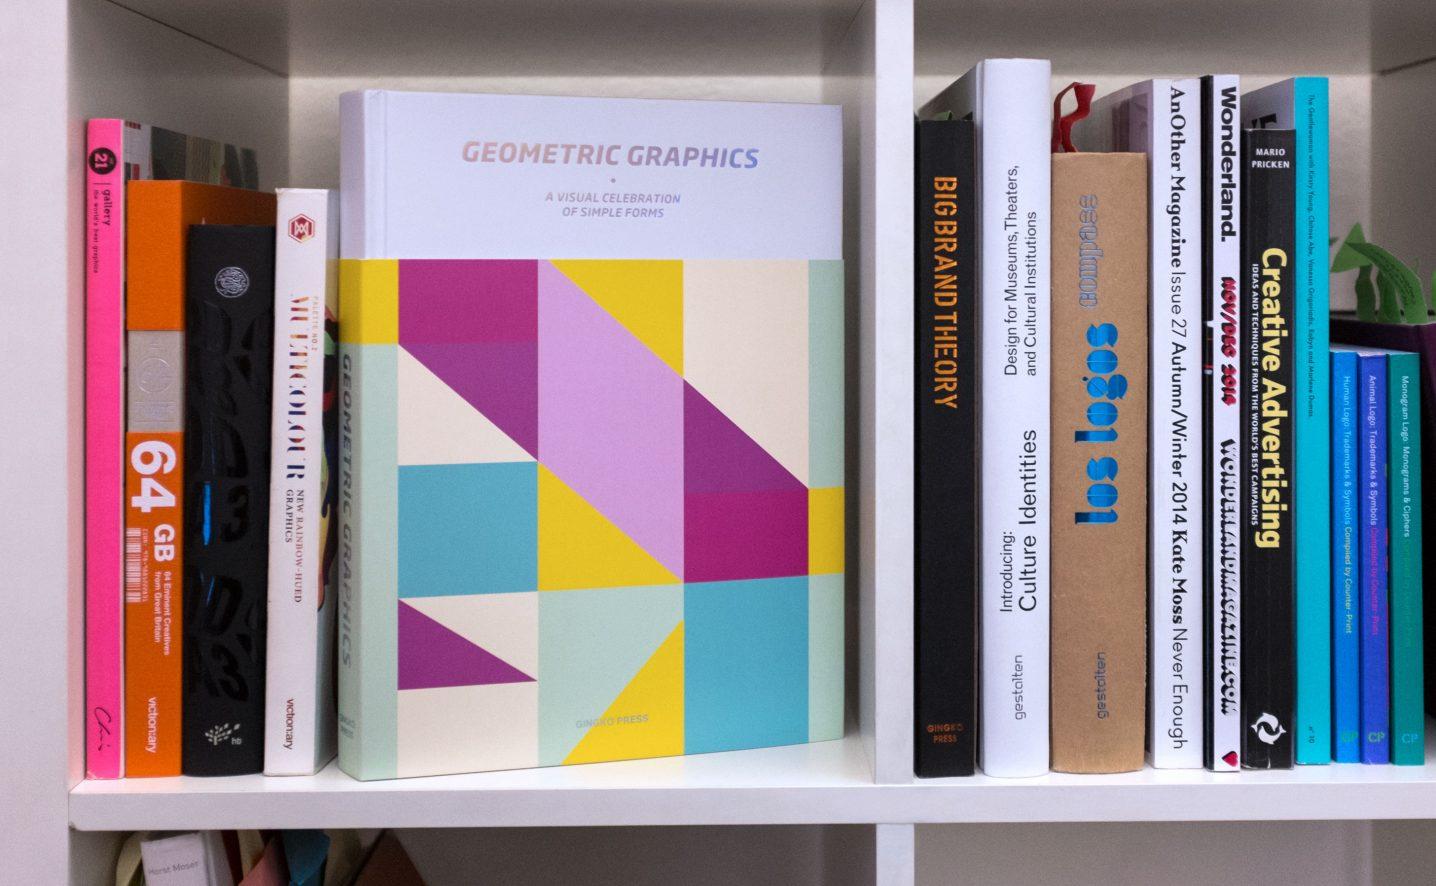 Geometric graphics feature Ascend